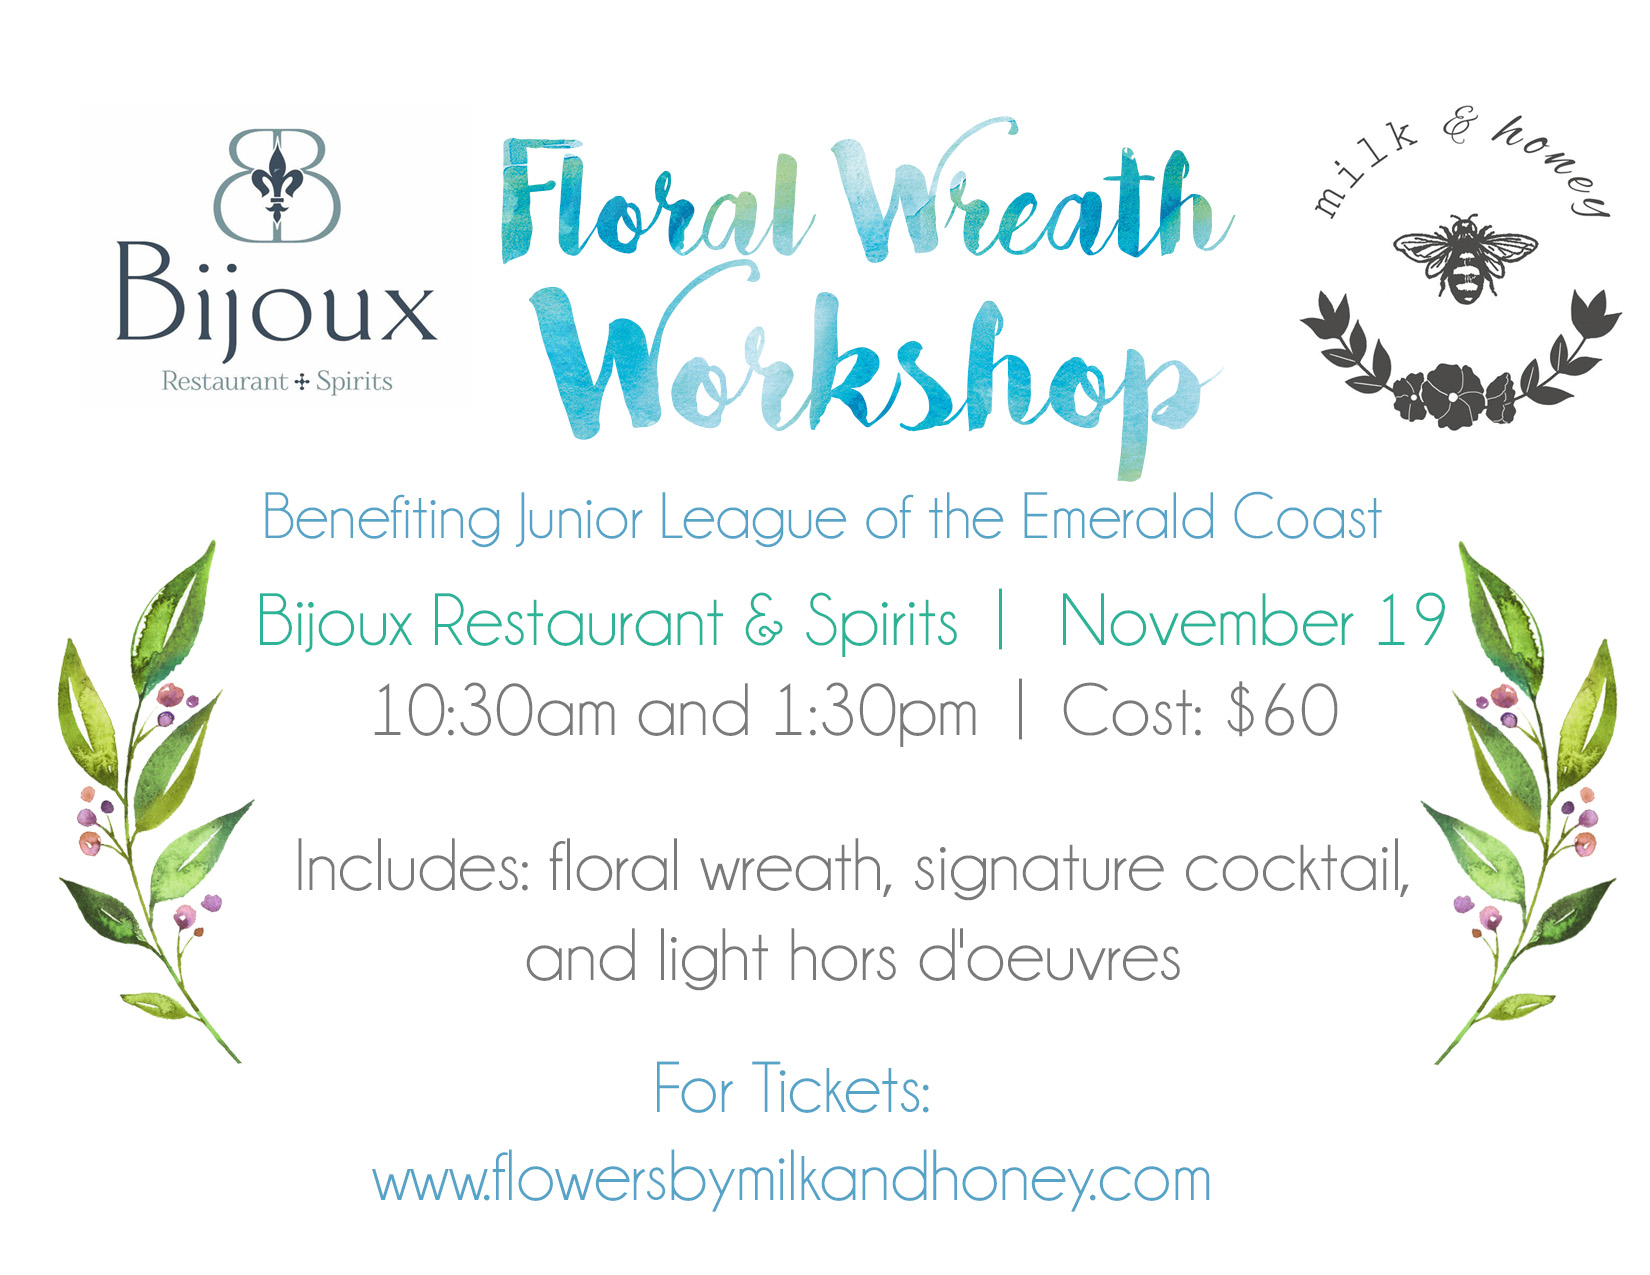 FloralWreathWorkshop